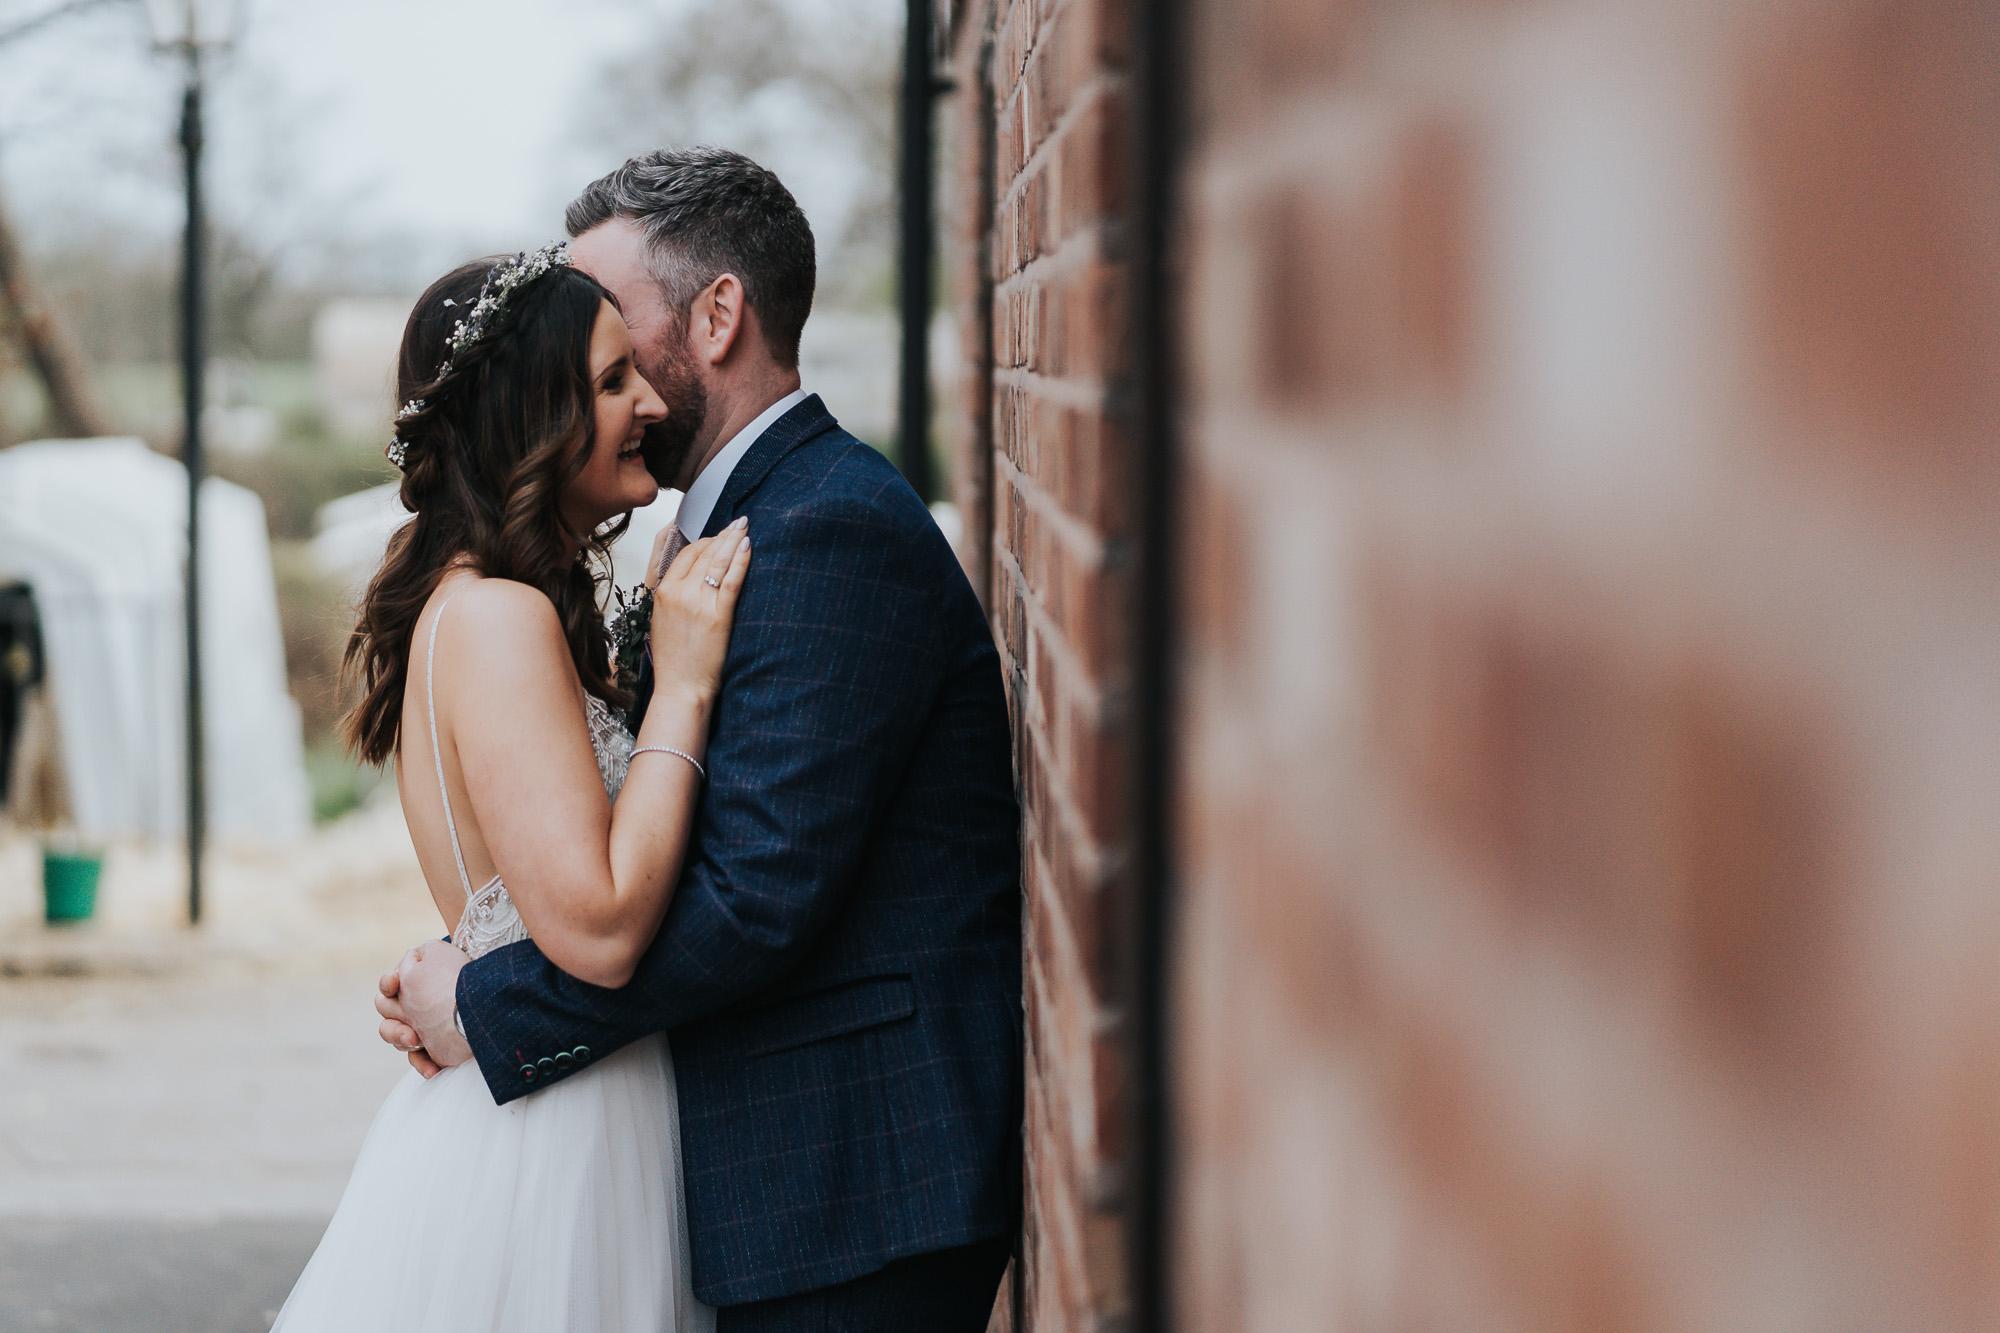 farm wedding in cheshire wedding photographer based in liverpool  (32 of 36).jpg